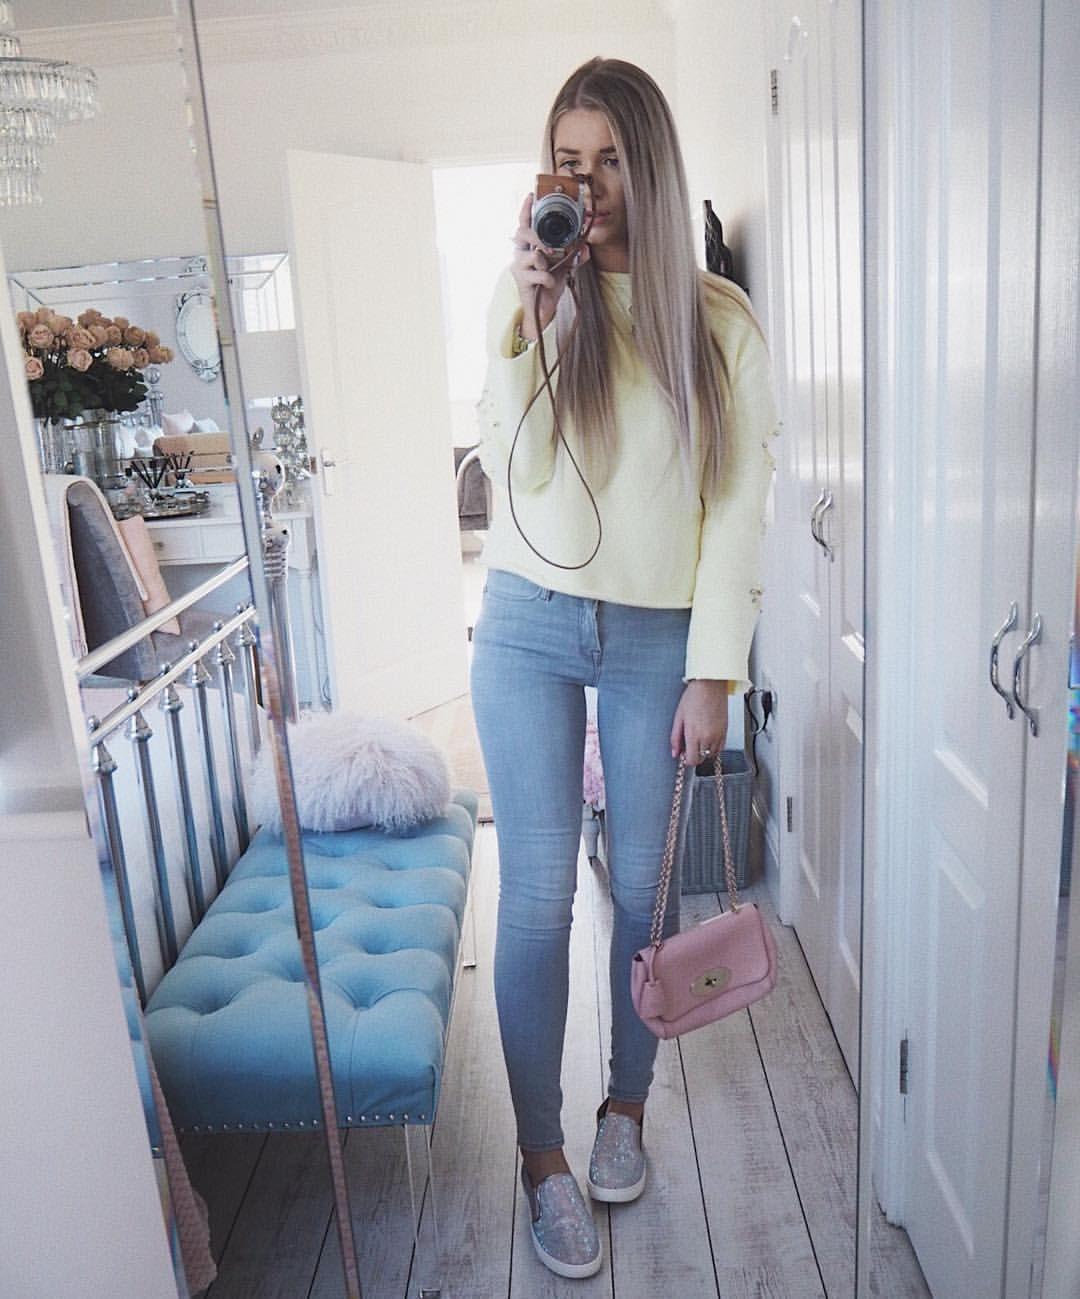 dbbf05c44 Instagram @emilyjanehardy River Island sweatshirt, allsaints jeans, pink  mulberry lily bag, spring style